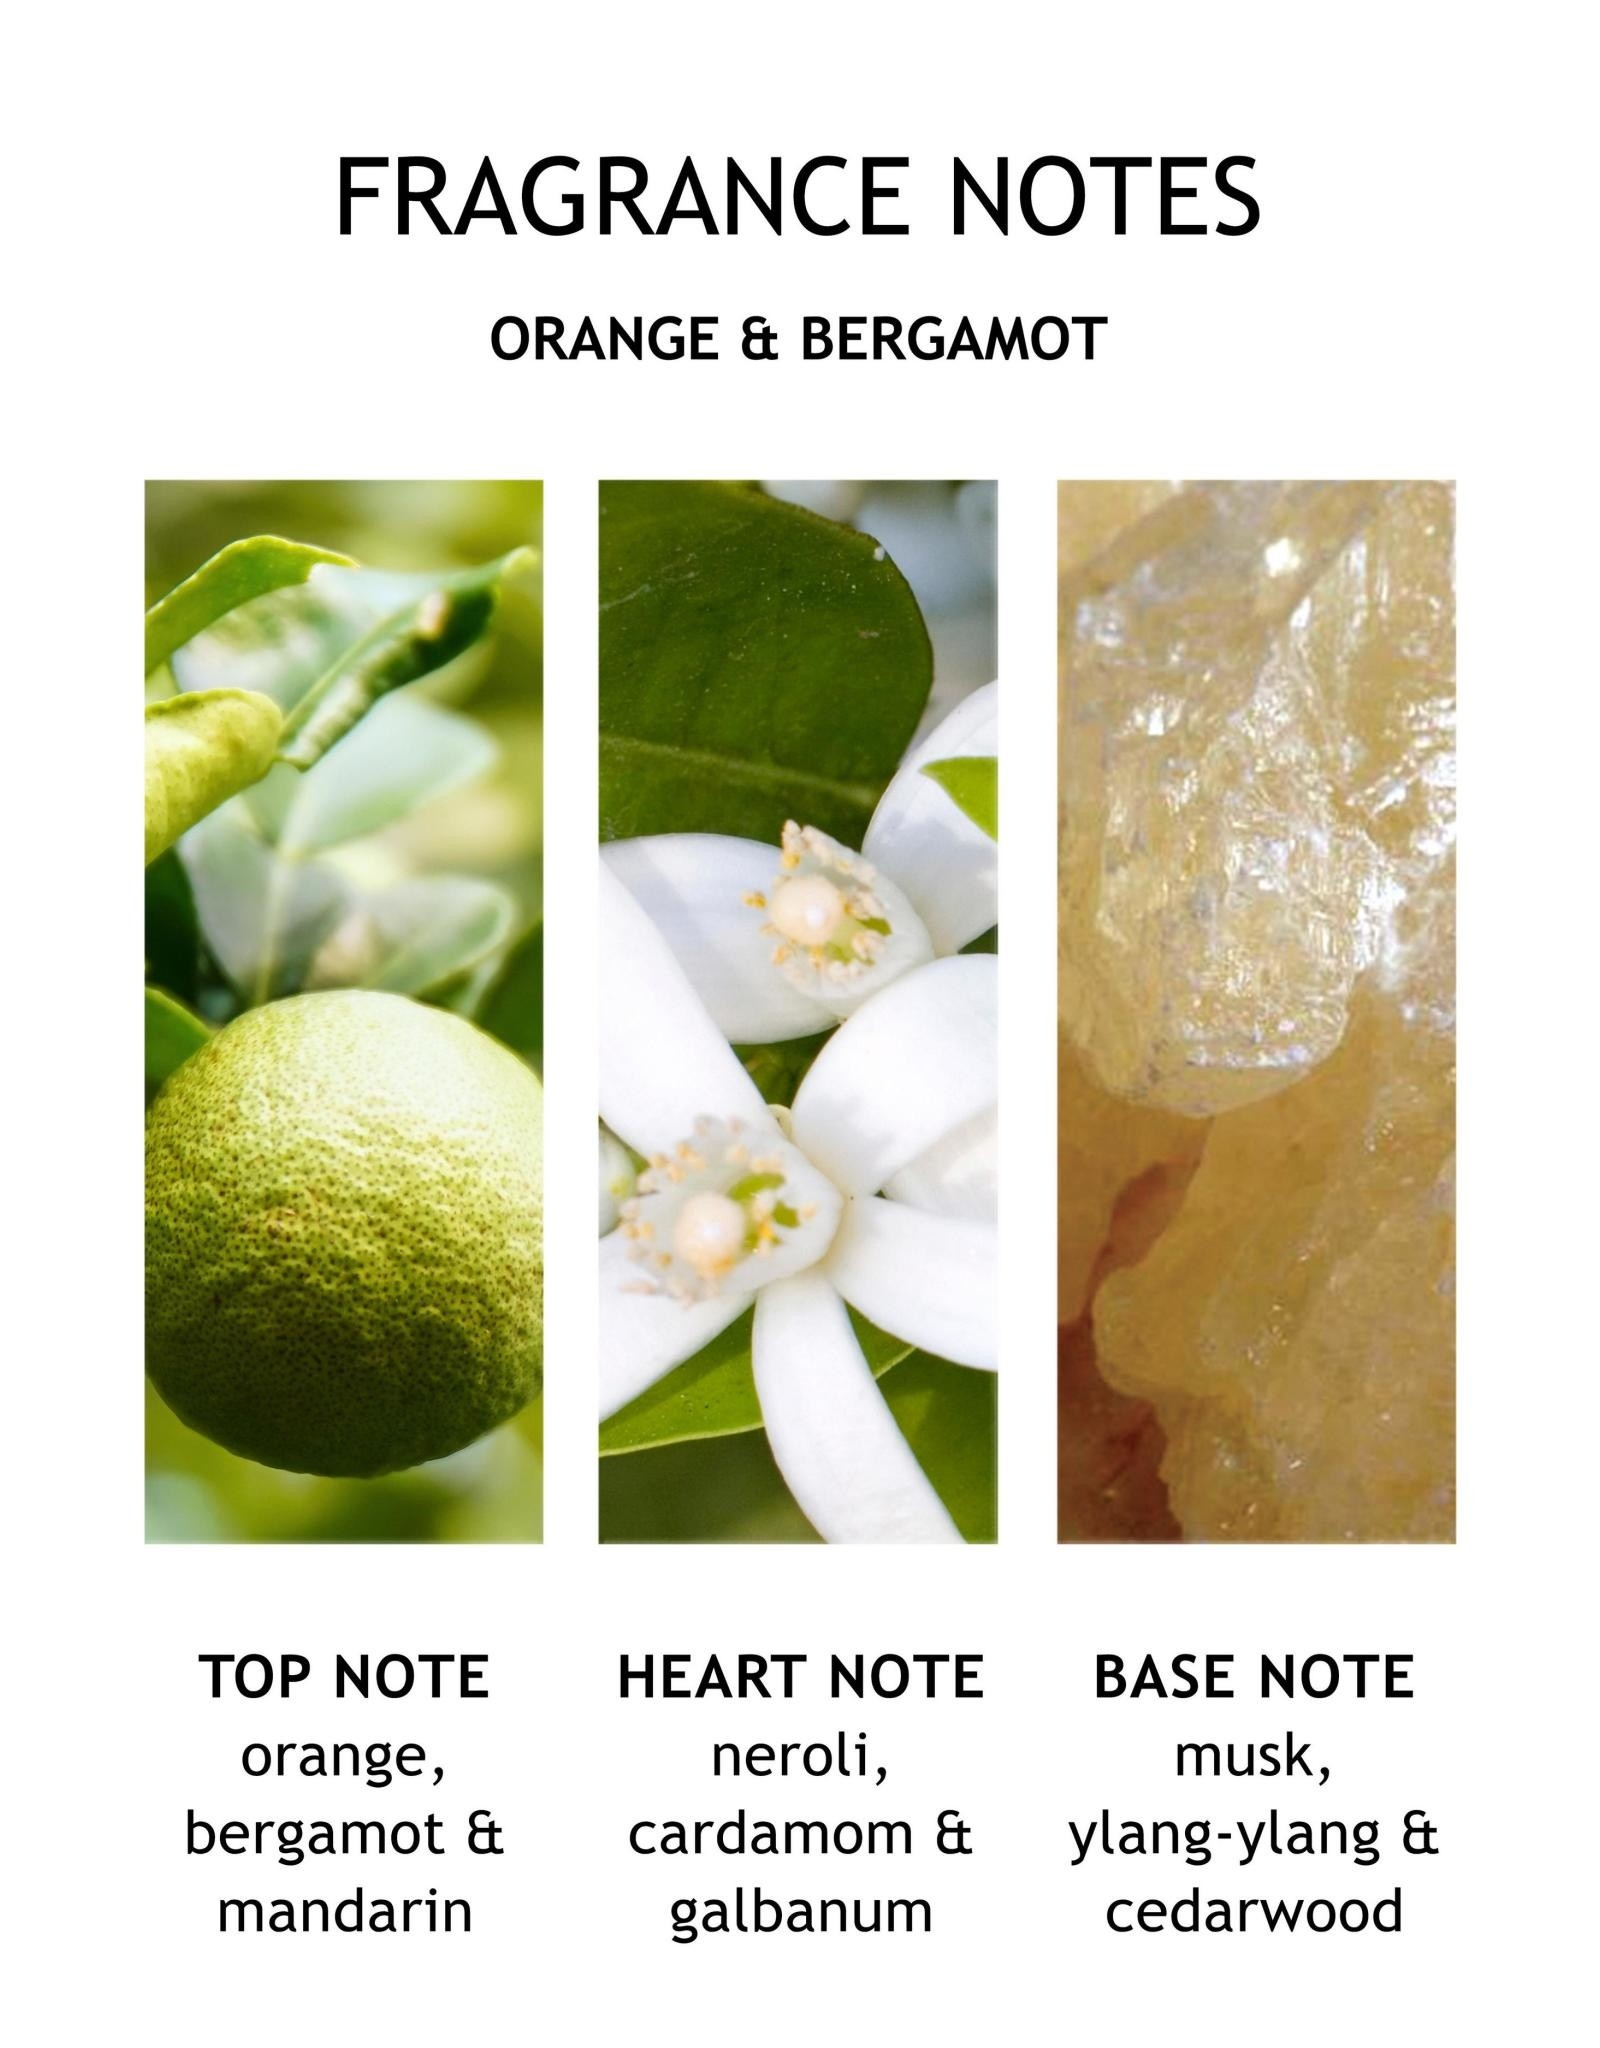 MBL Hand Lotion Orange + Bergmot